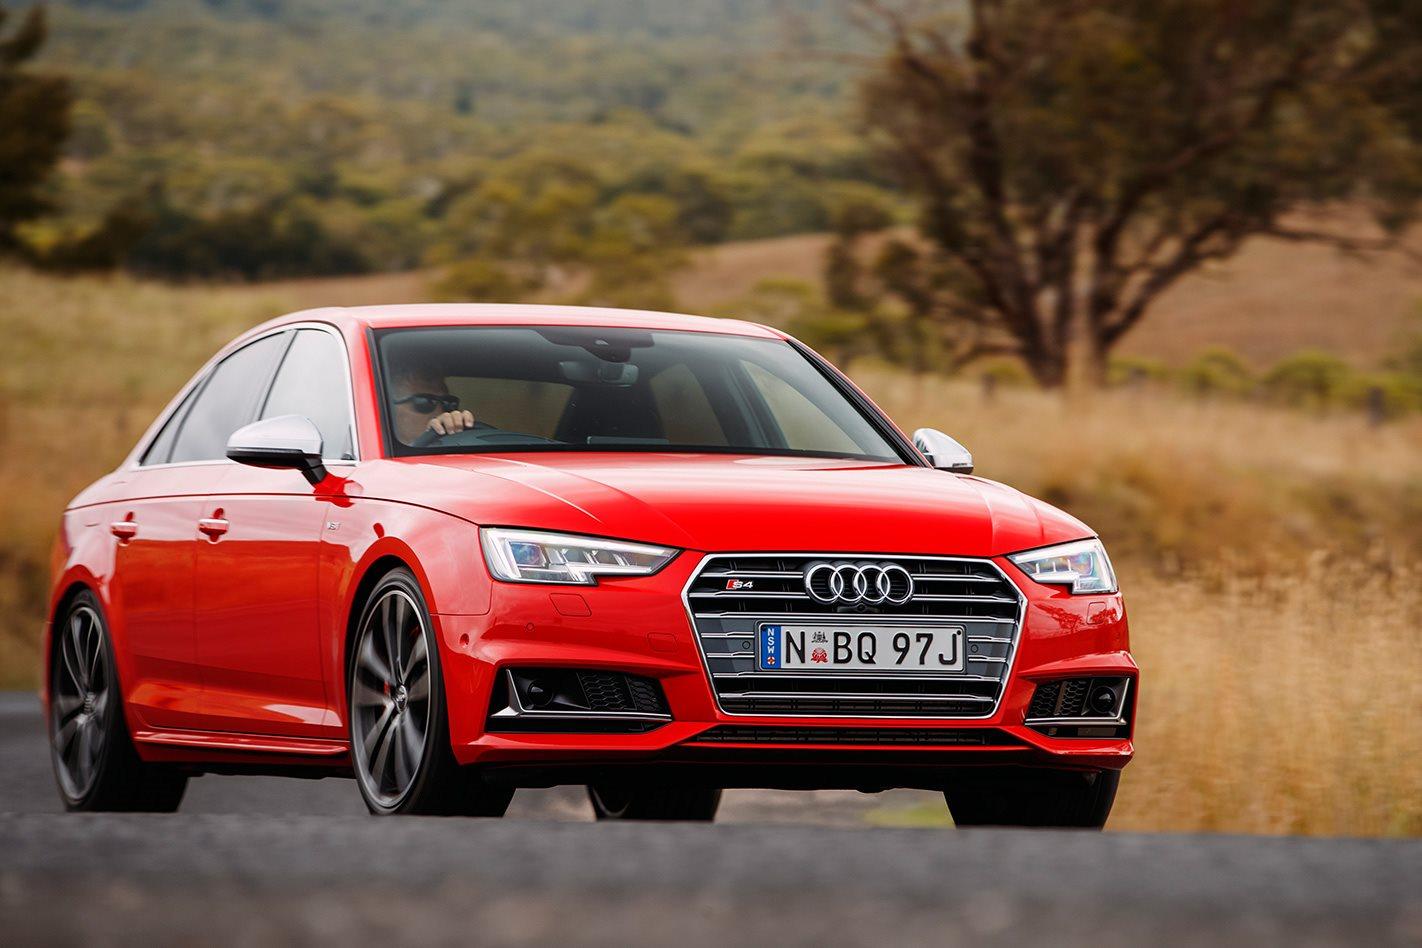 Kelebihan Audi S4 2017 Murah Berkualitas